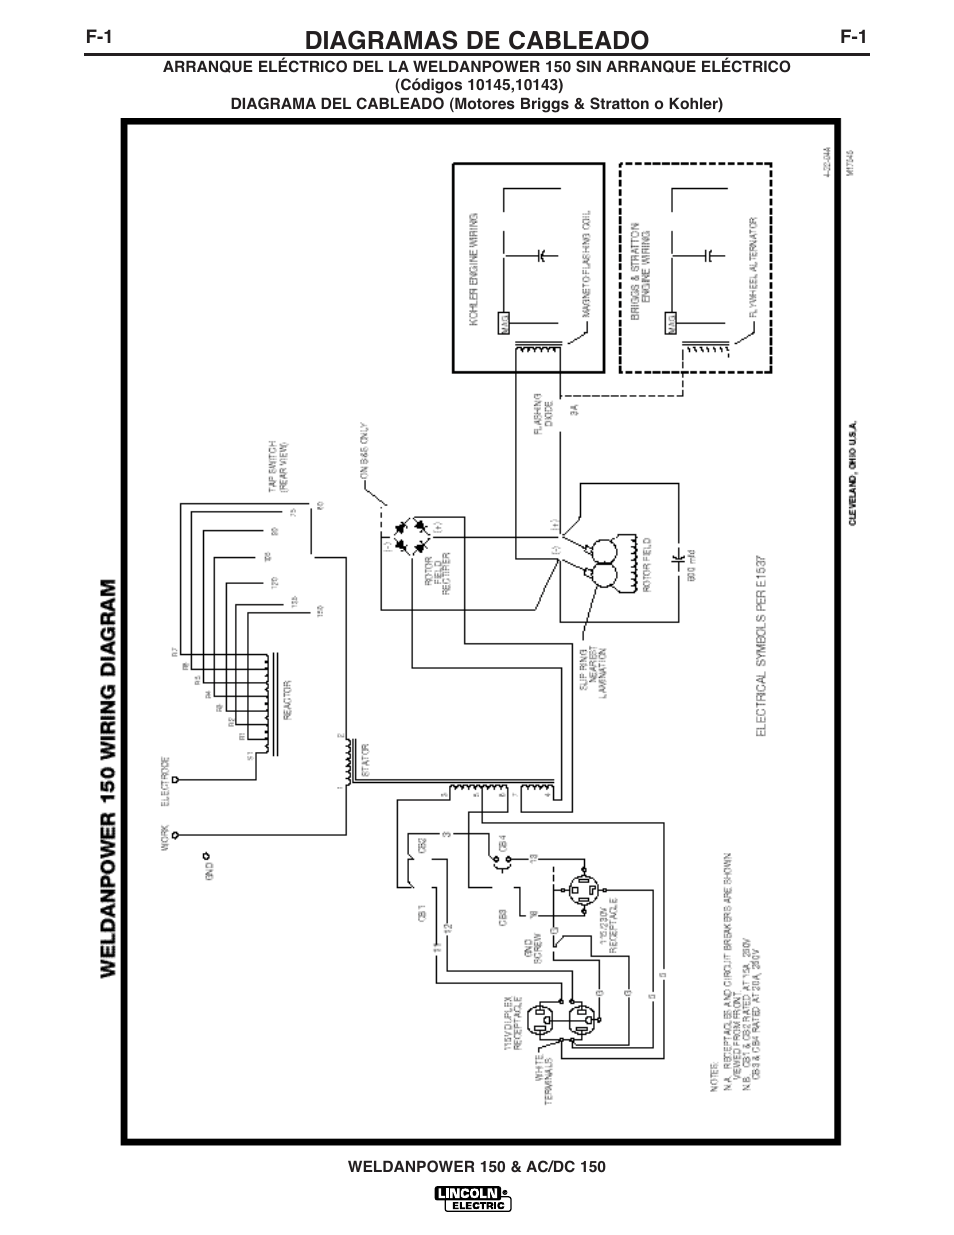 medium resolution of diagramas de cableado lincoln electric im413 weldanpower 150 user manual page 17 30